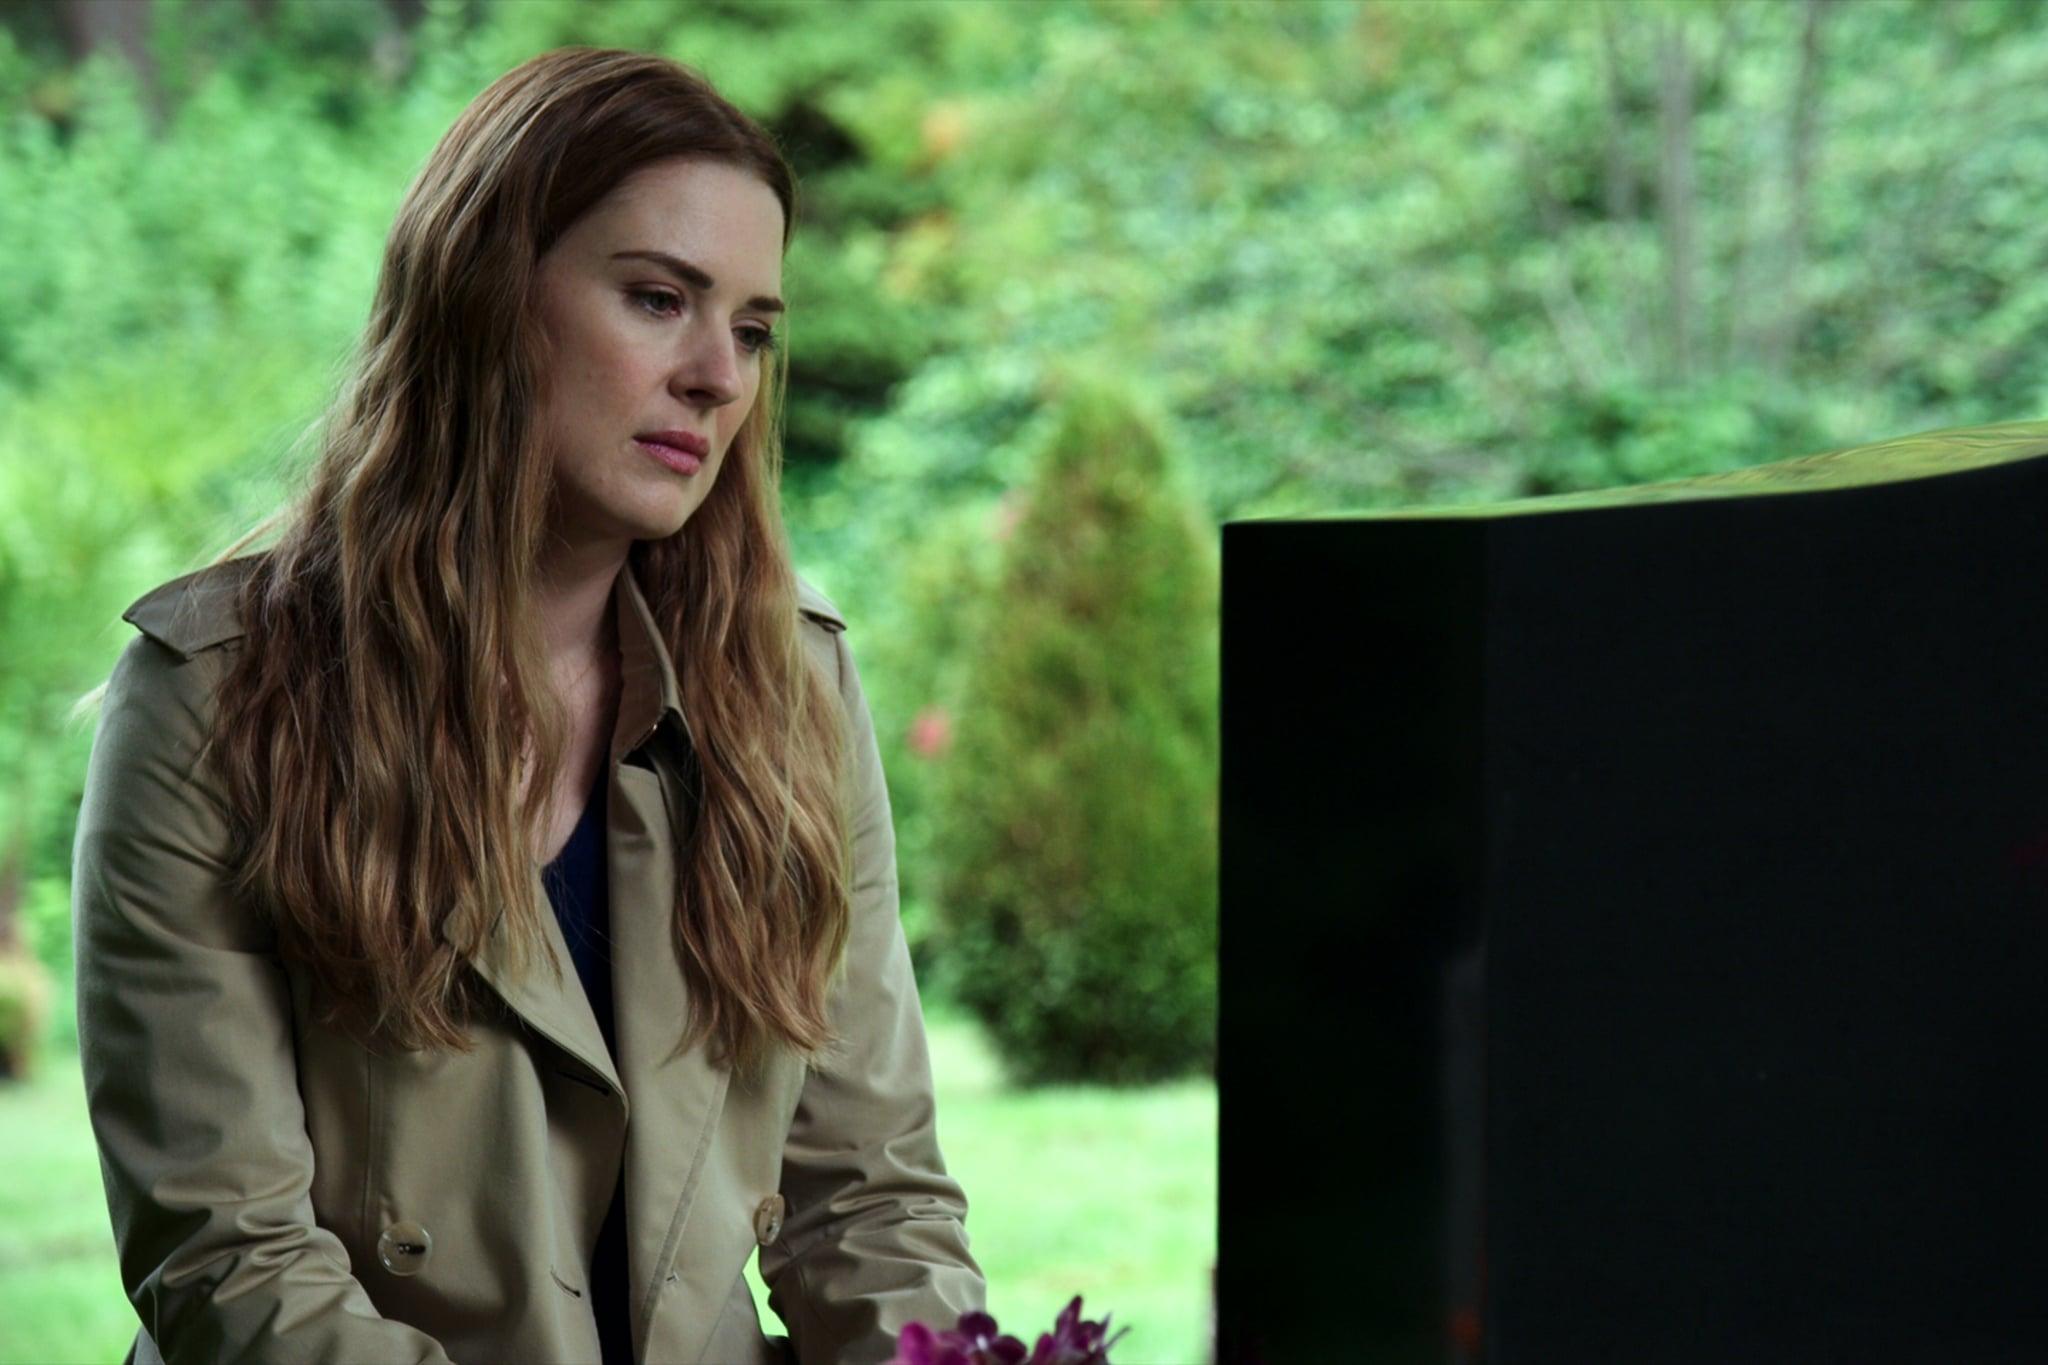 VIRGIN RIVER - Alexandra Breckenridge as Melinda Monroe of VIRGIN RIVER - NETFLIX (c) 2020